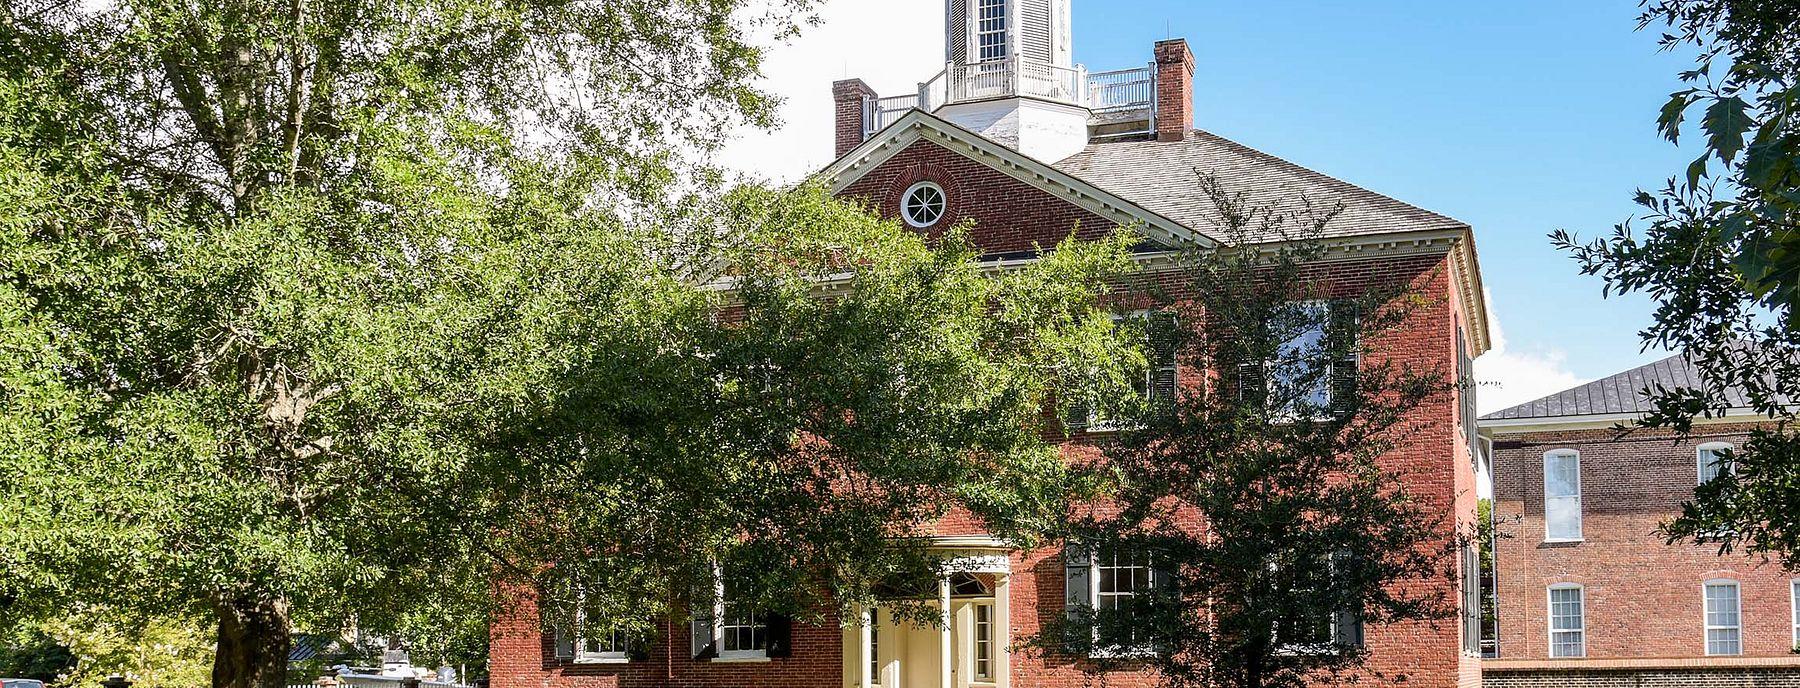 The New Bern Academy